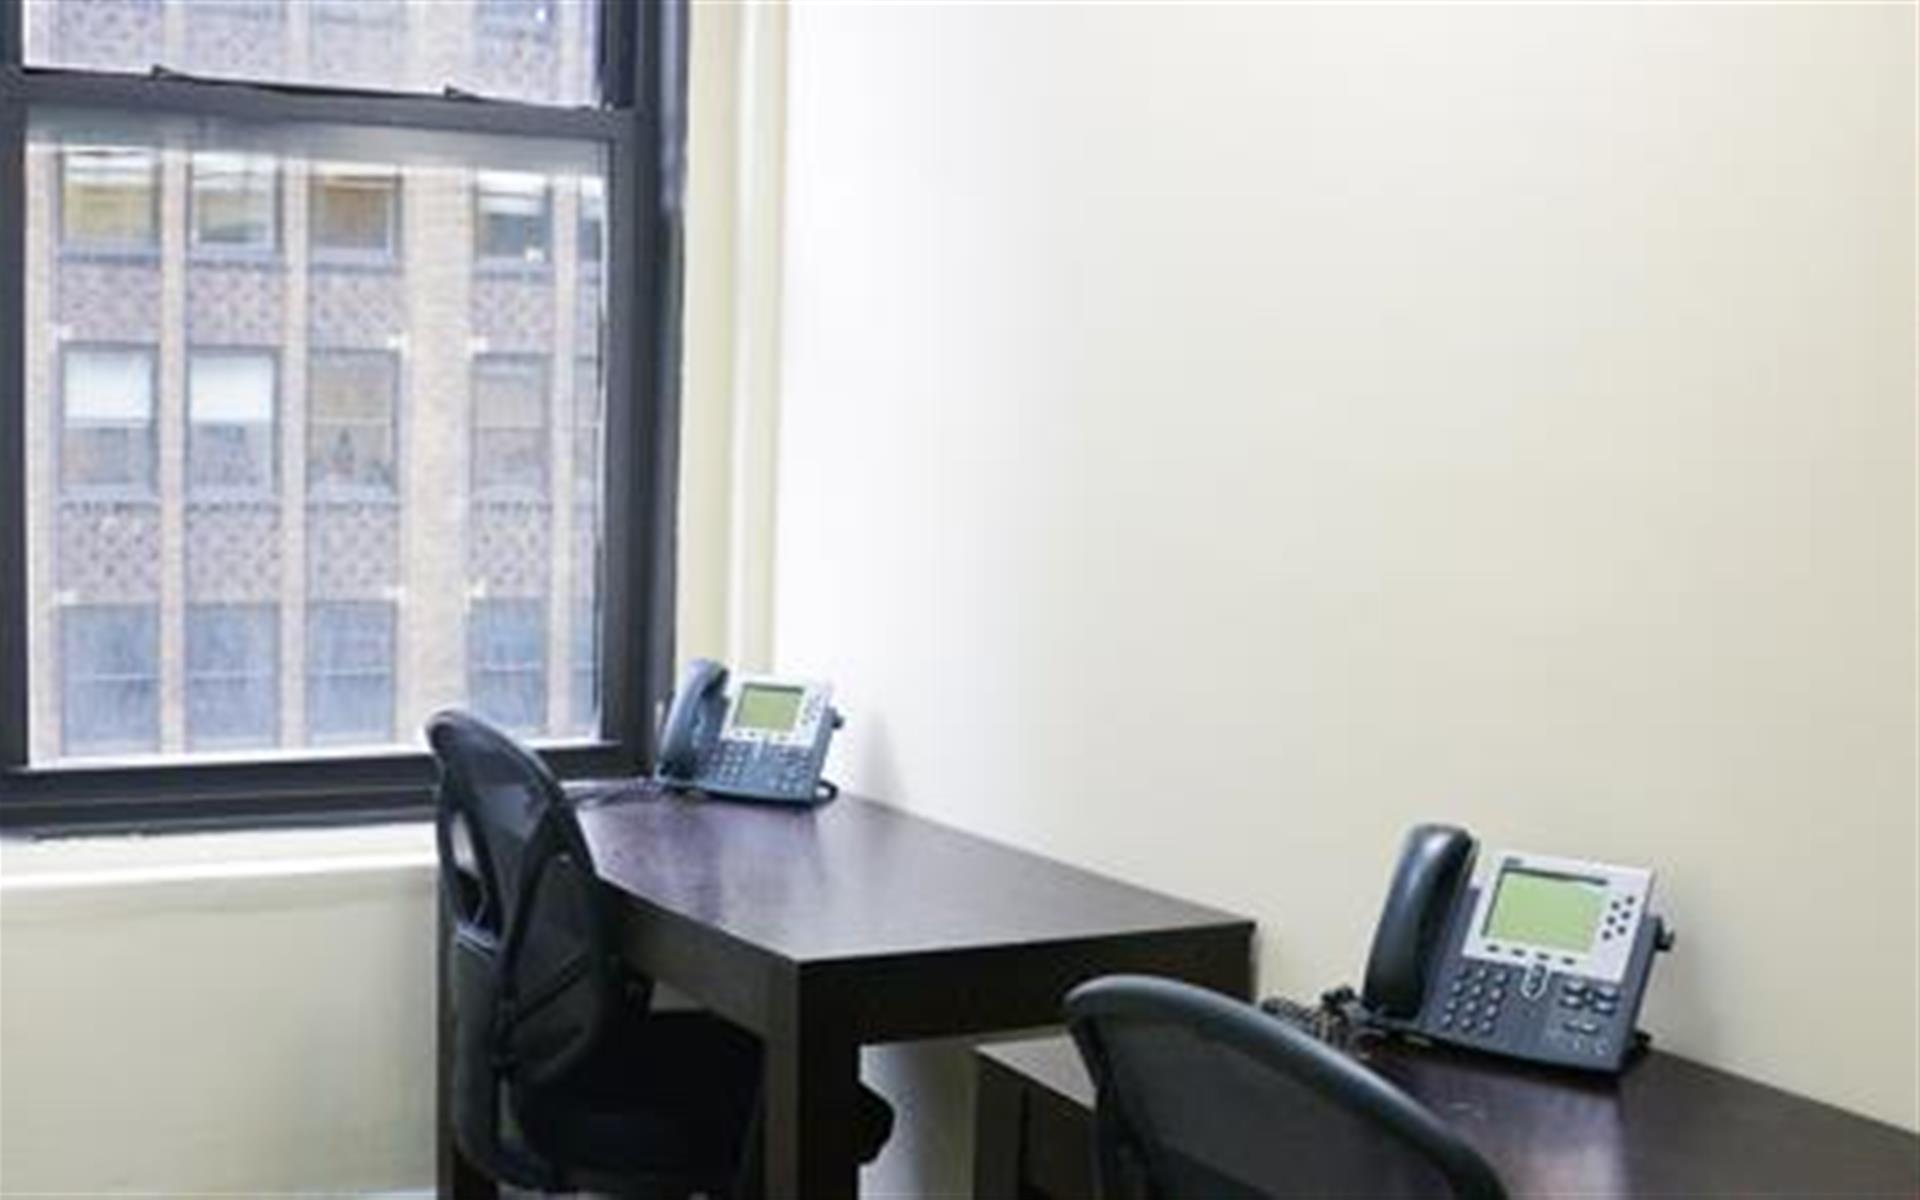 Jay Suites Penn Station - Windowed Office Suite Facing Broadway